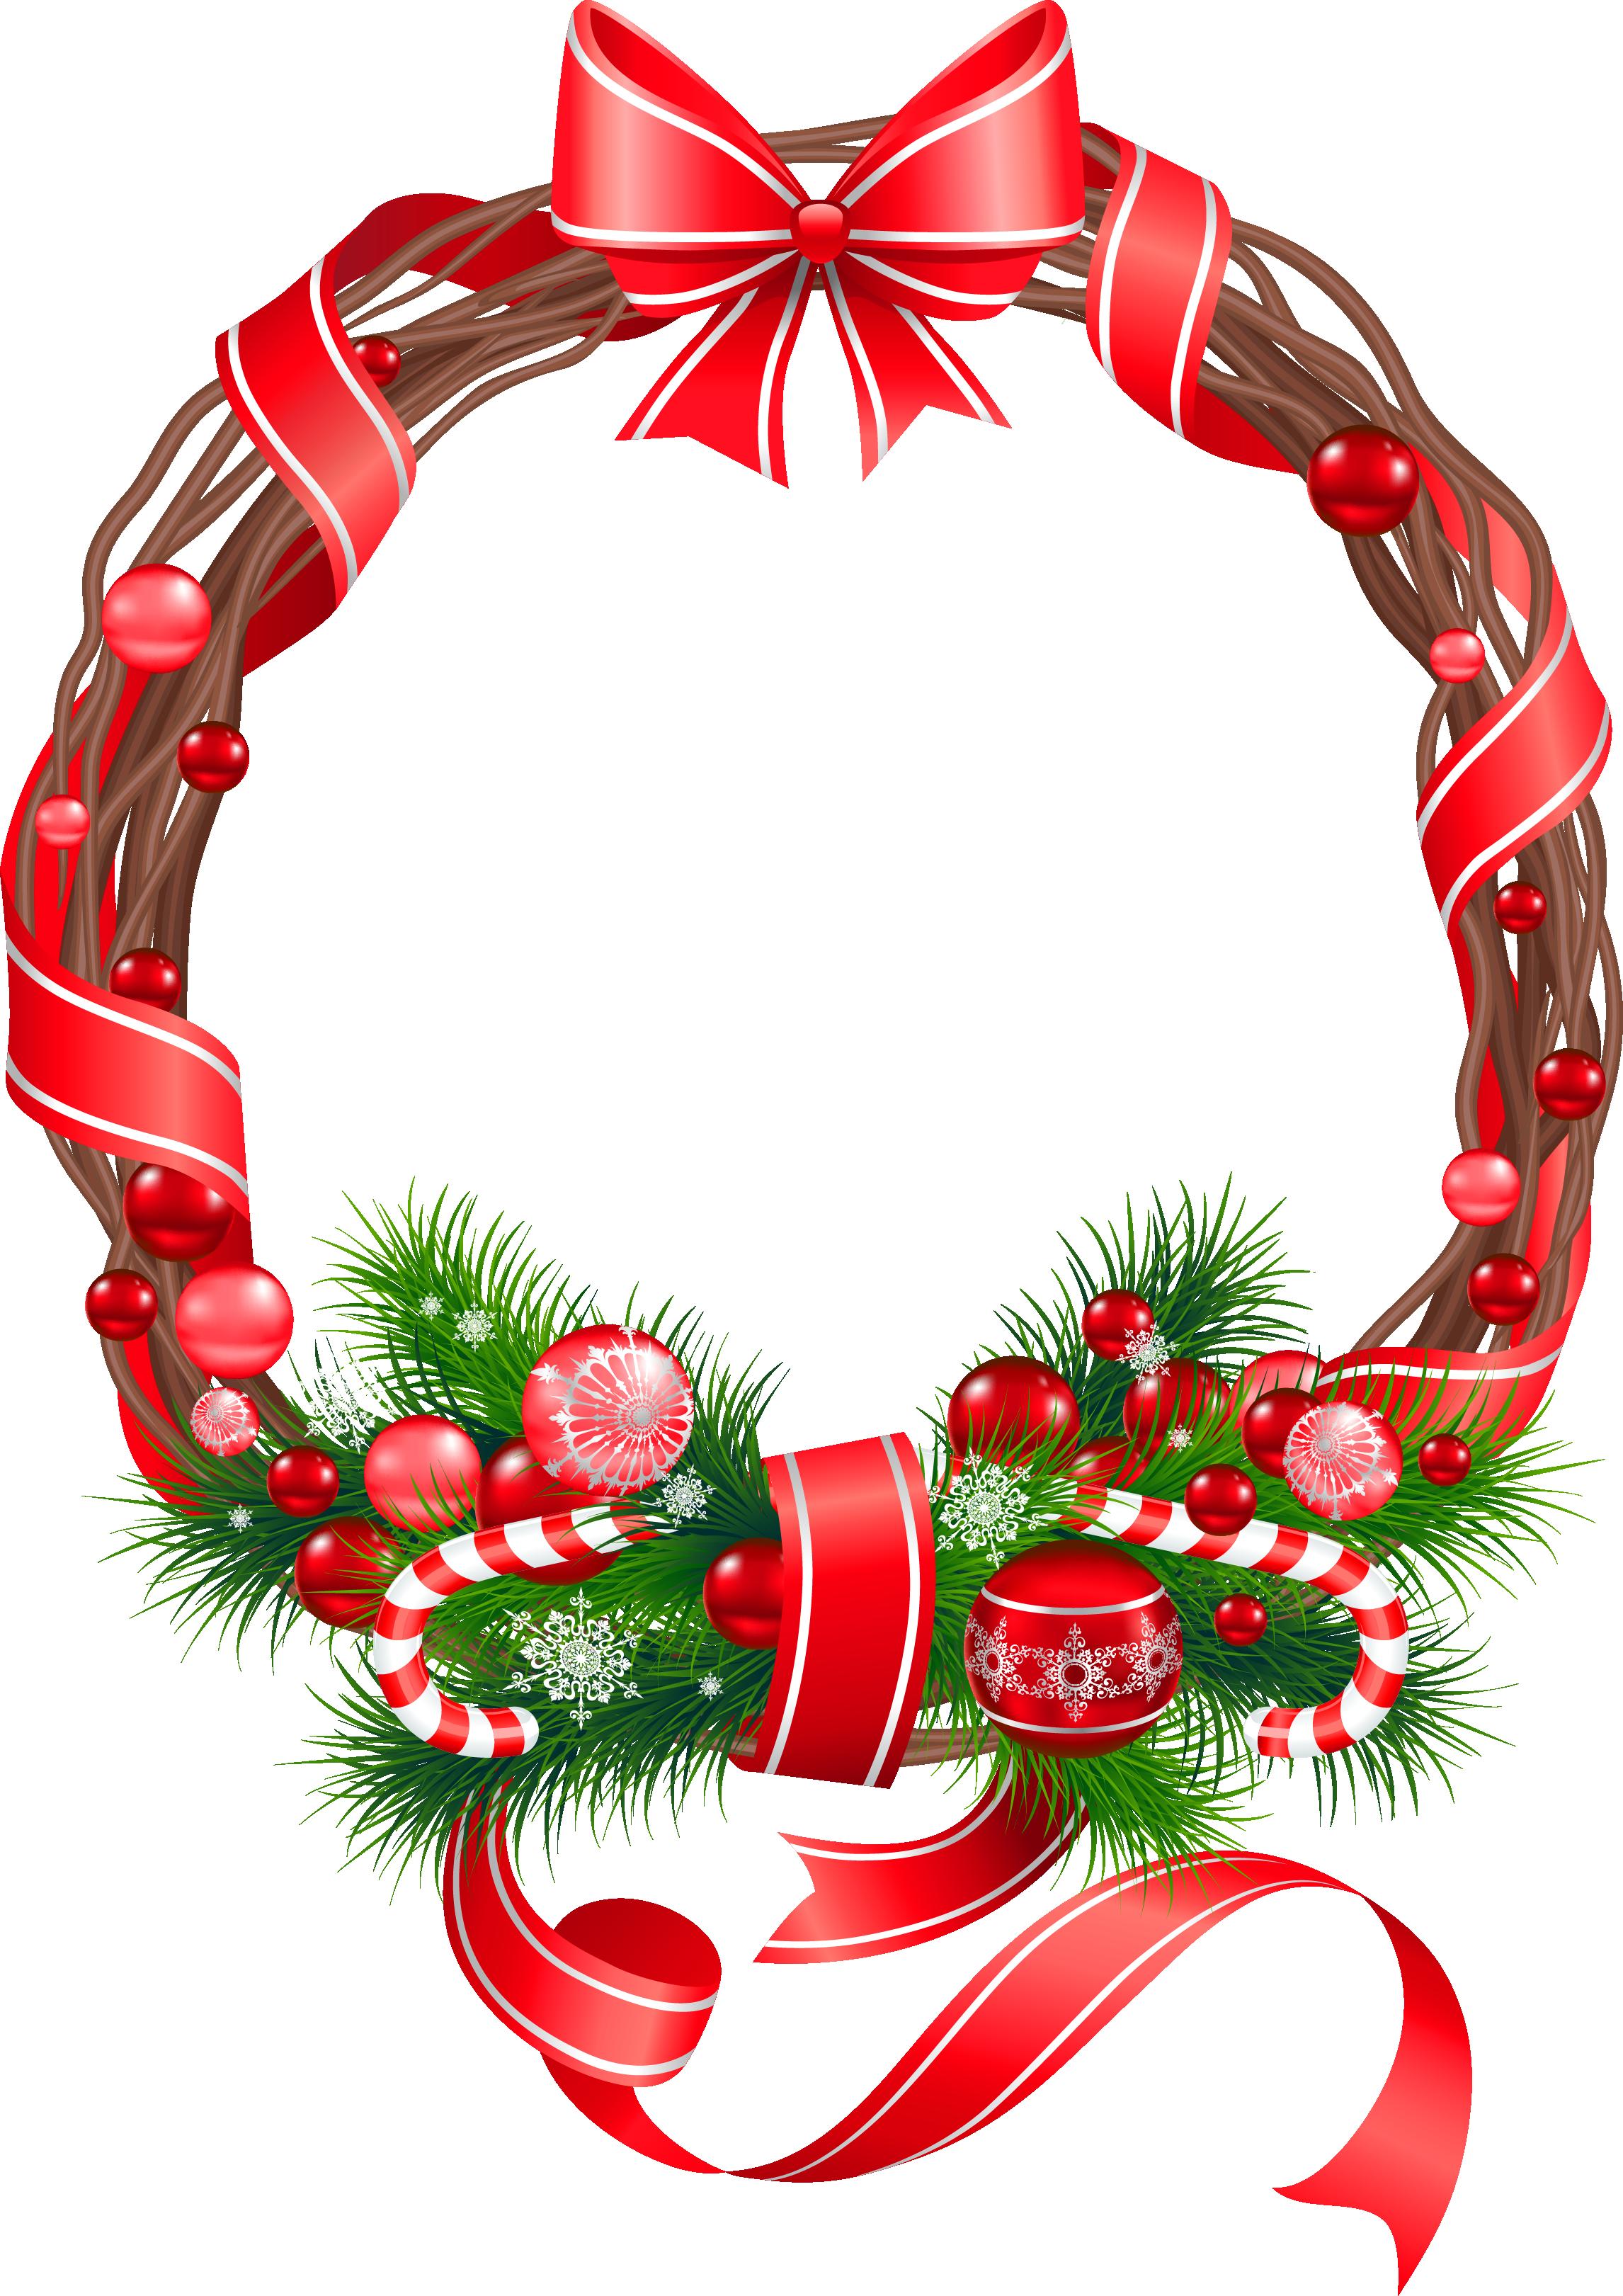 Free Christmas Wreath Clip Art - Cliparts.co